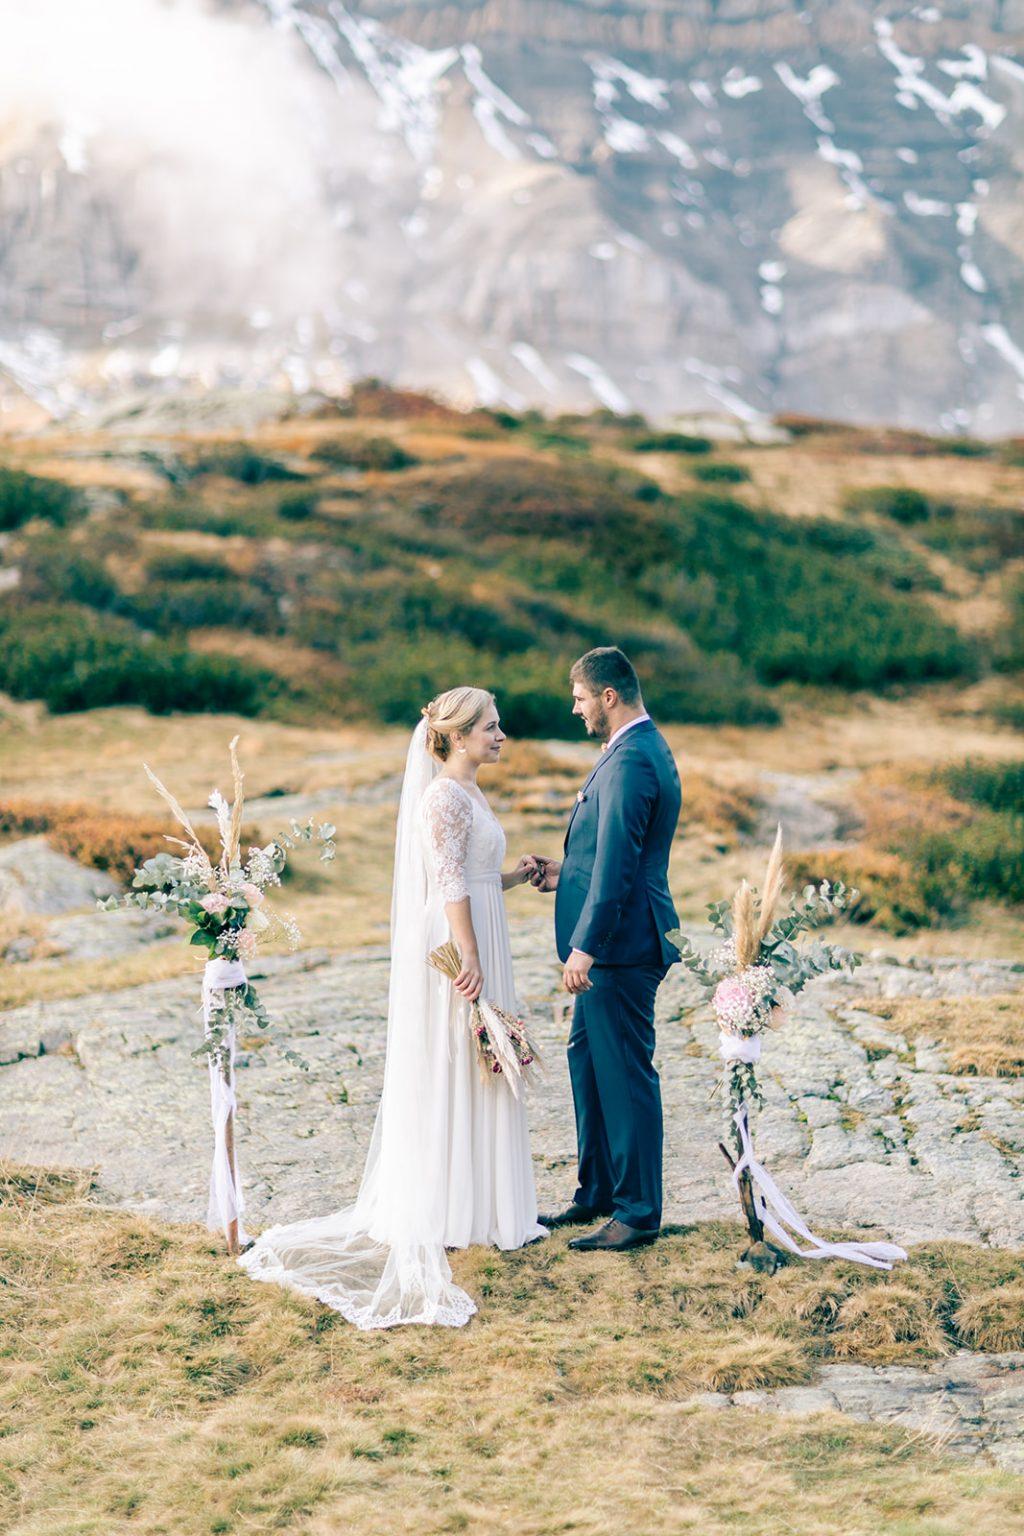 elopement-mariage-aventure-nature-alpes-maries-montagne-sauvage